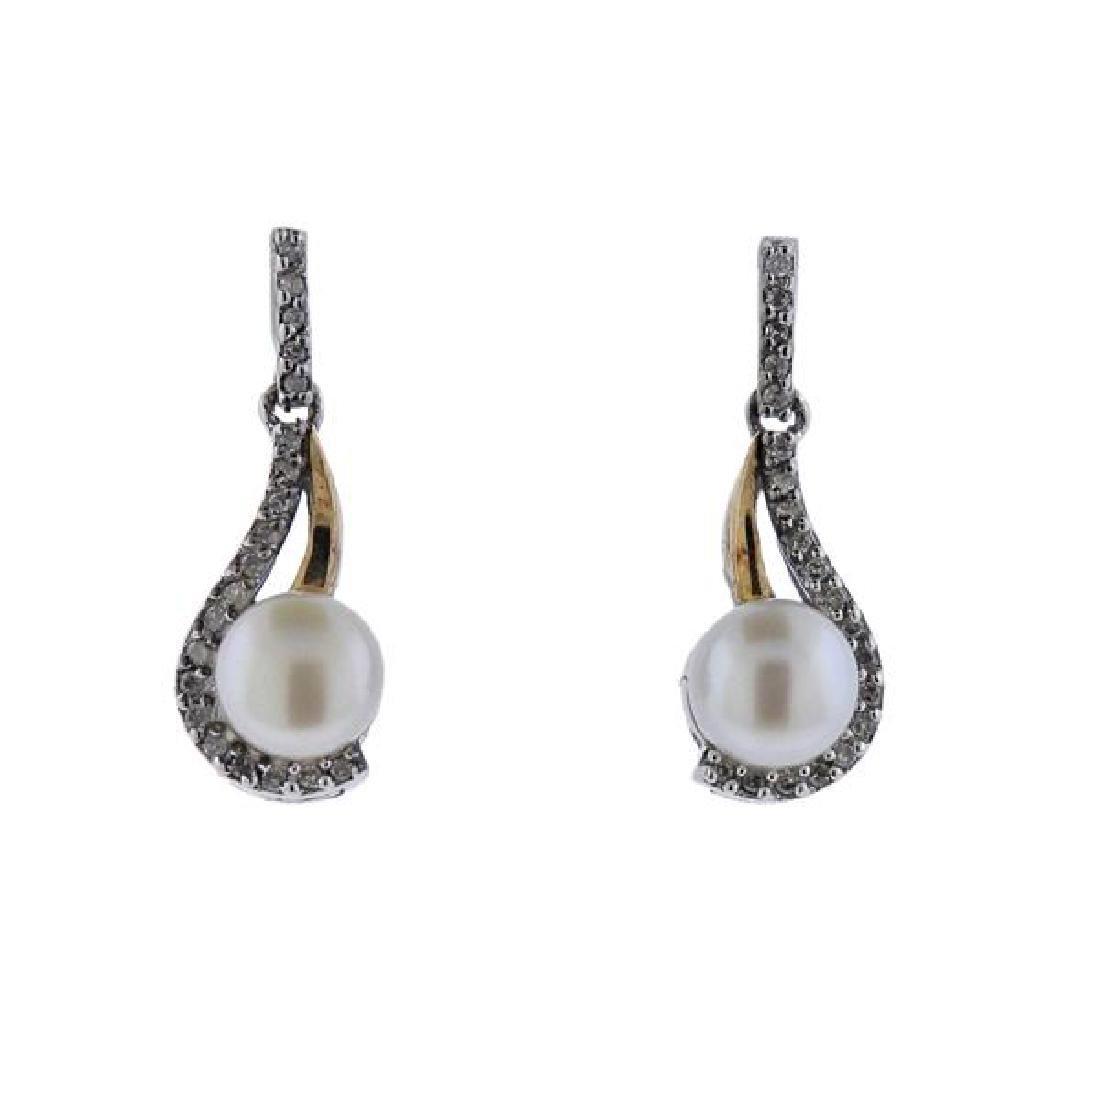 14K Gold Sterling Diamond Pearl Earrings Pendant Set - 3